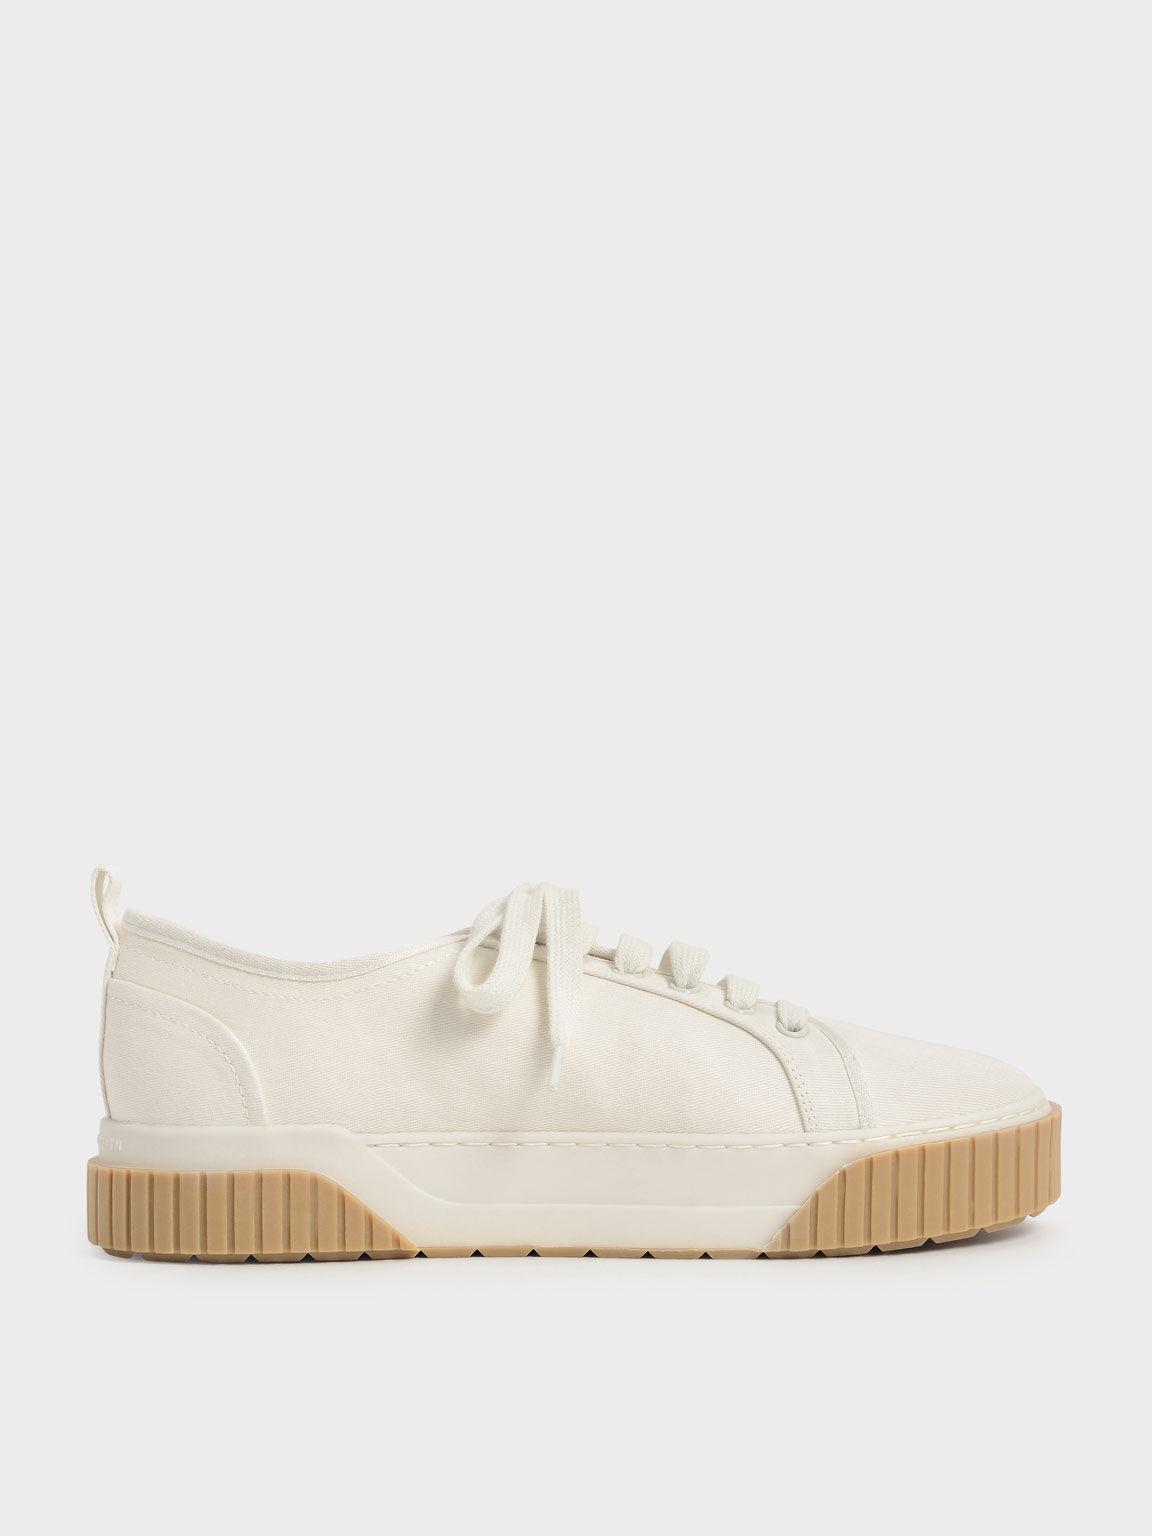 Cotton Low-Top Sneakers, Cream, hi-res